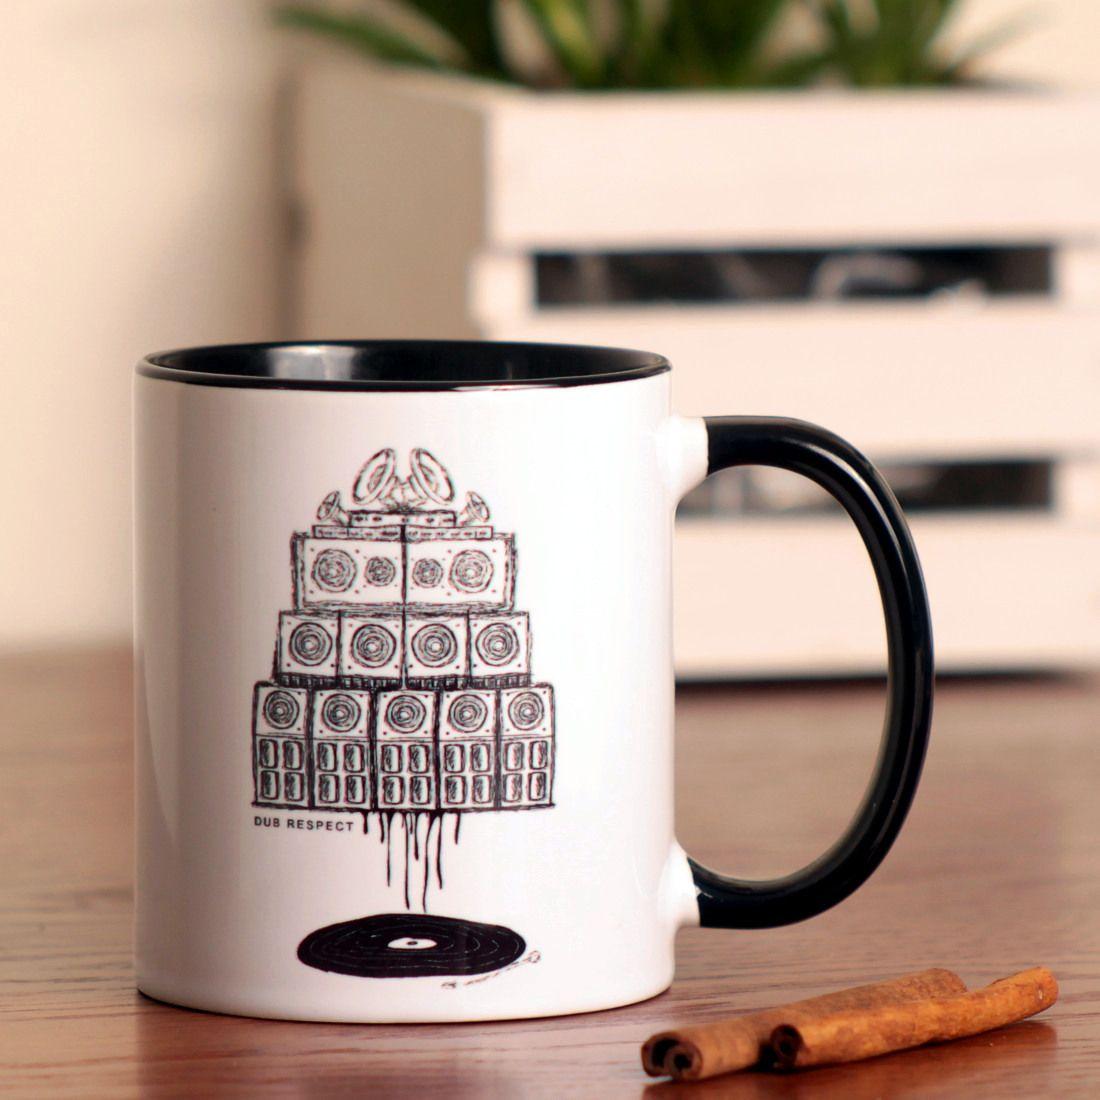 Rasta Accessories » Mugs & Cups » Vinyl & Sound System wall